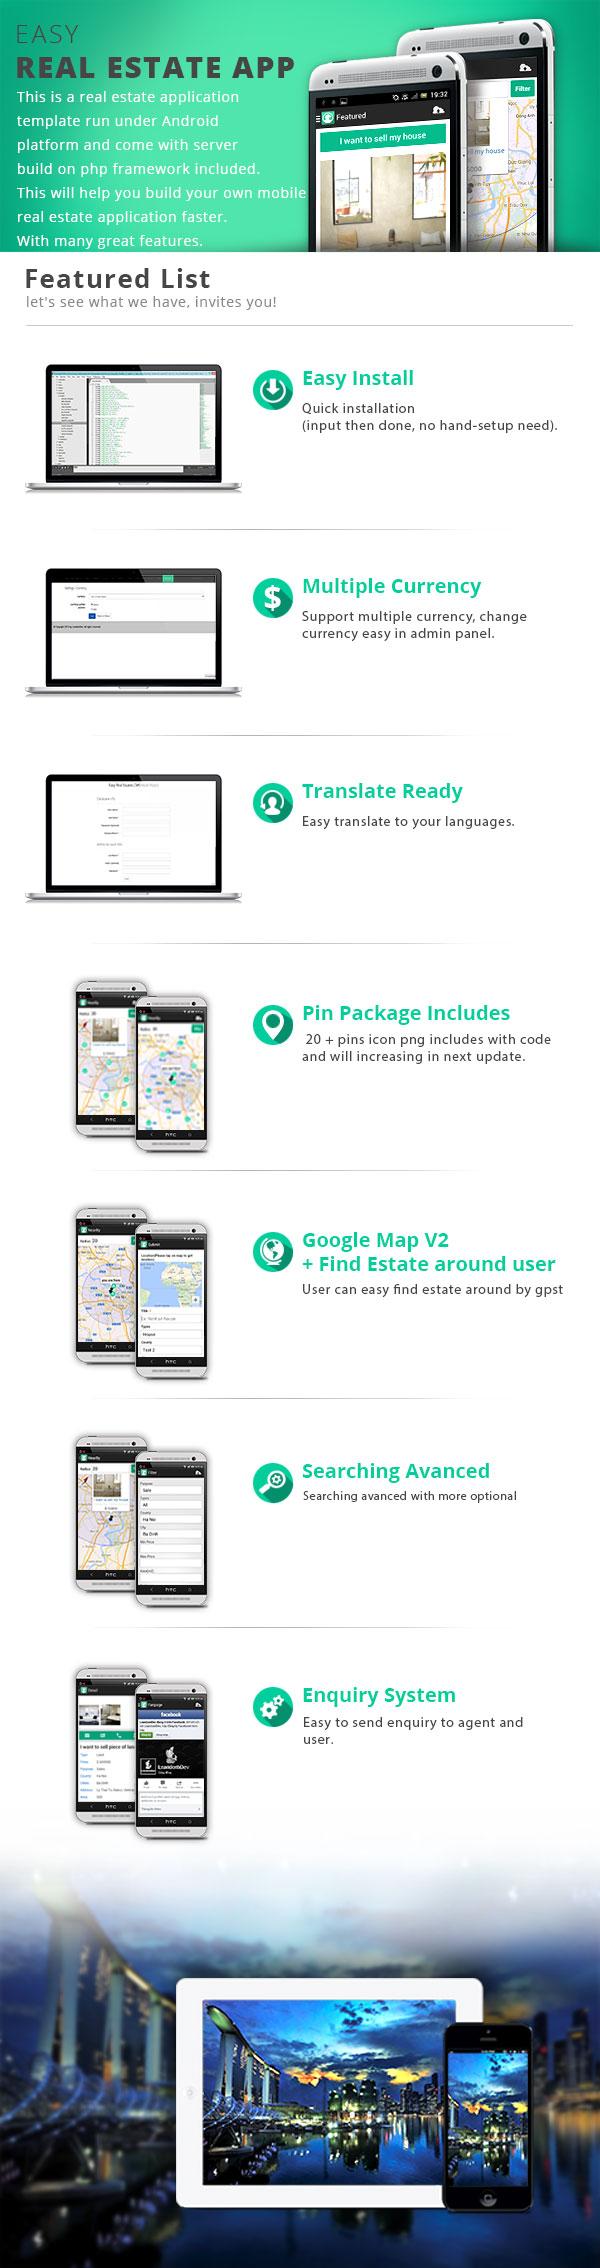 mobile app features Cairo Web Design